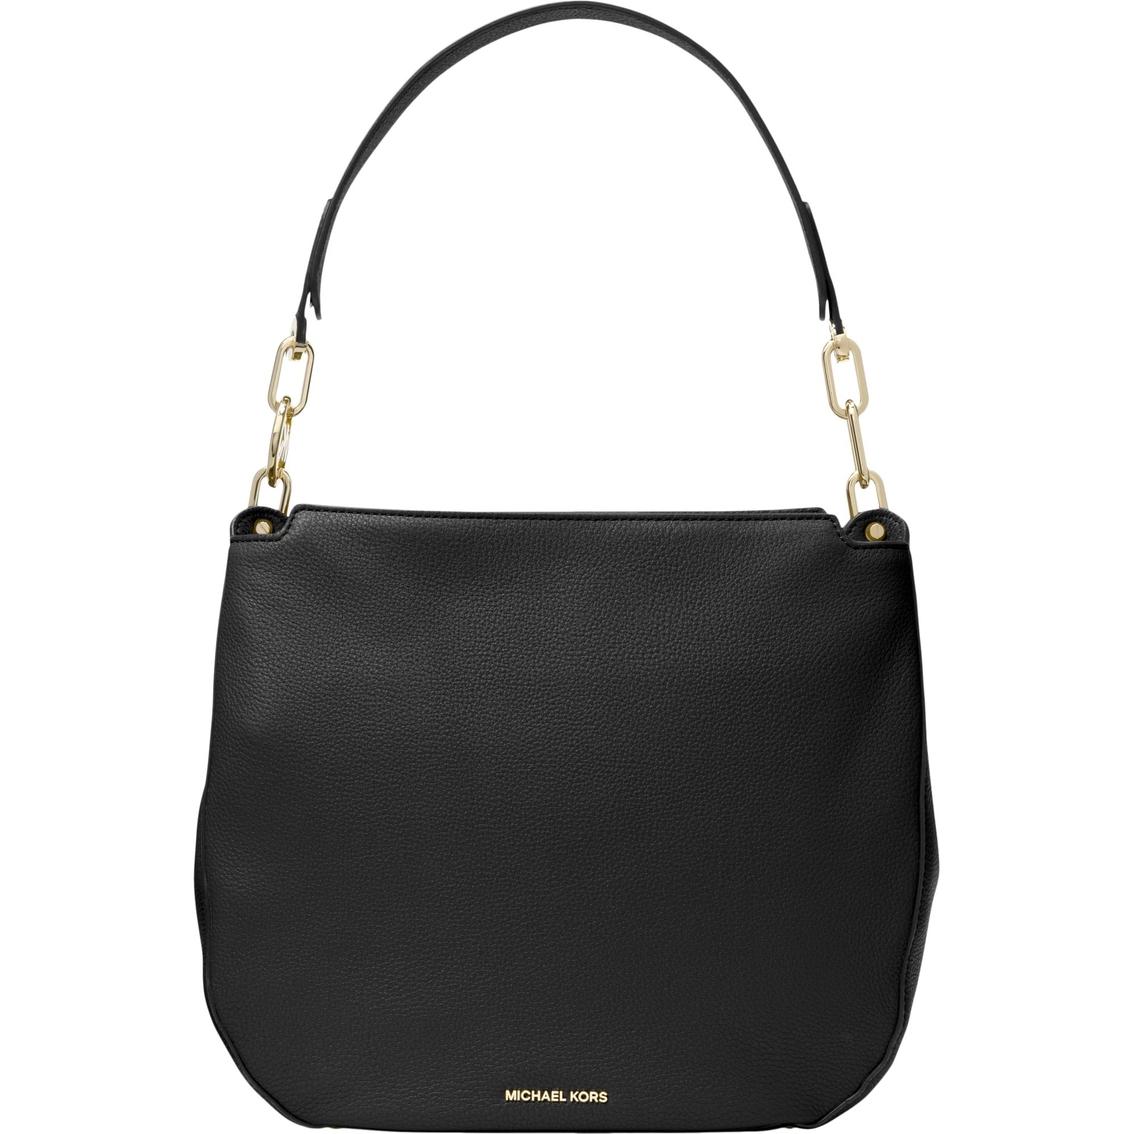 202125acad4d Michael Kors Fulton Large Hobo Handbag Leather